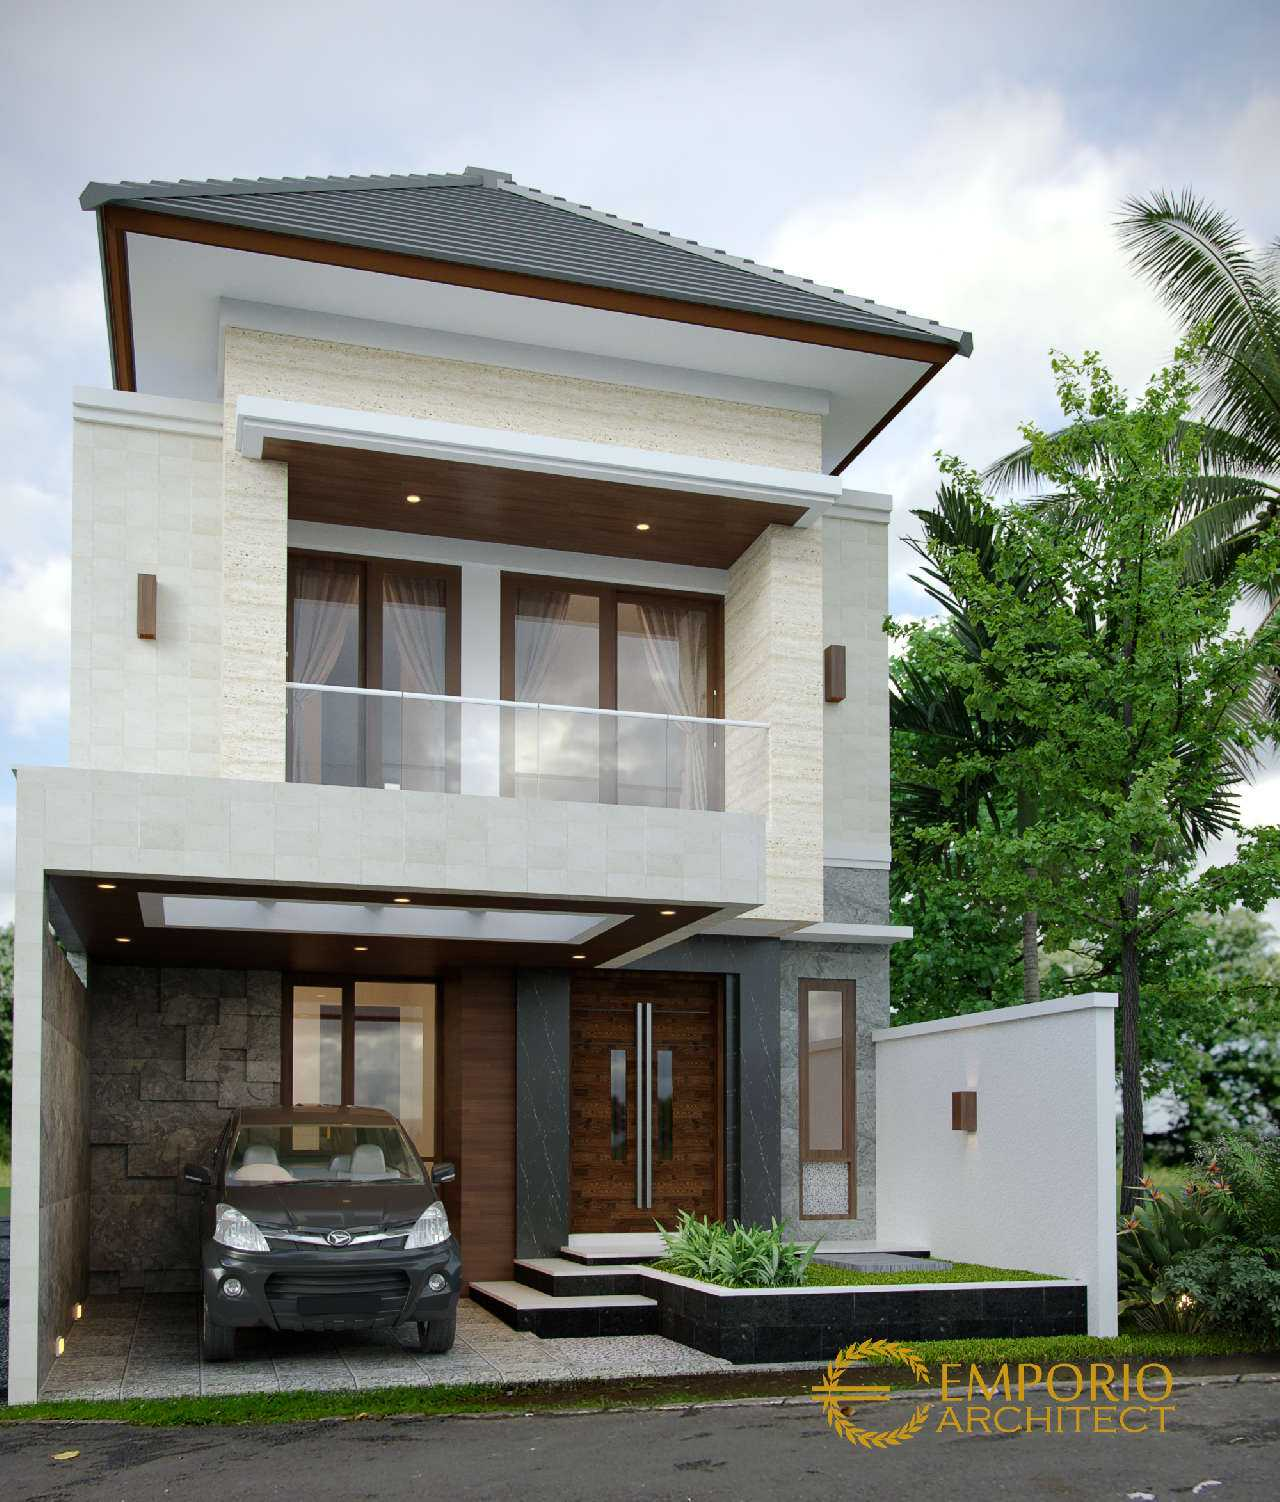 Photo Emporio-architect-jasa-arsitek-badung-desain-rumah